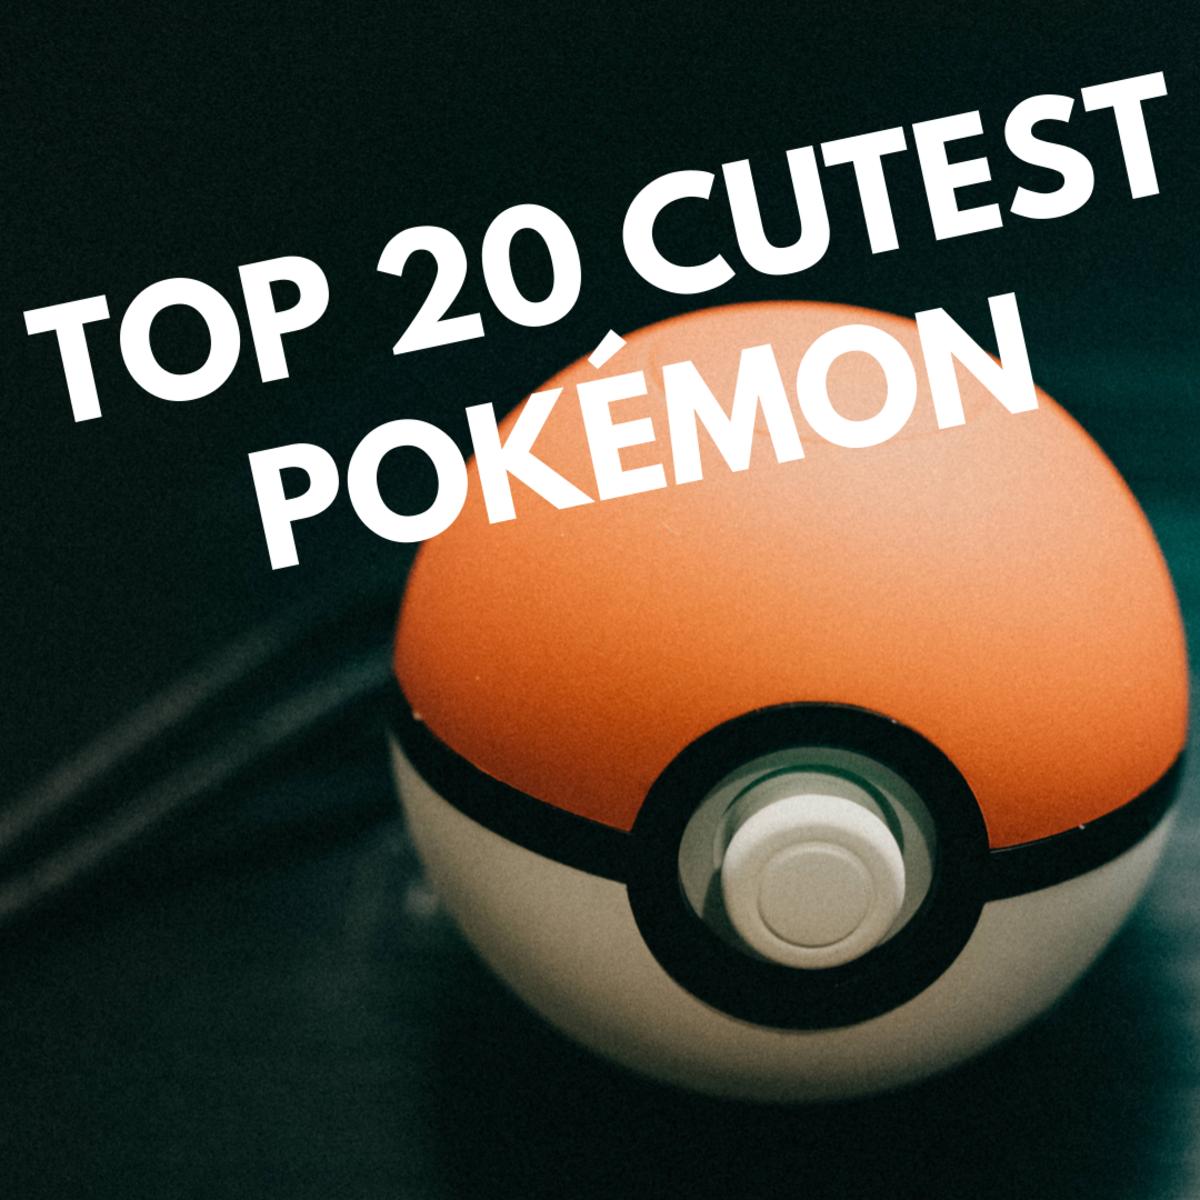 Top 20 Cutest Pokémon